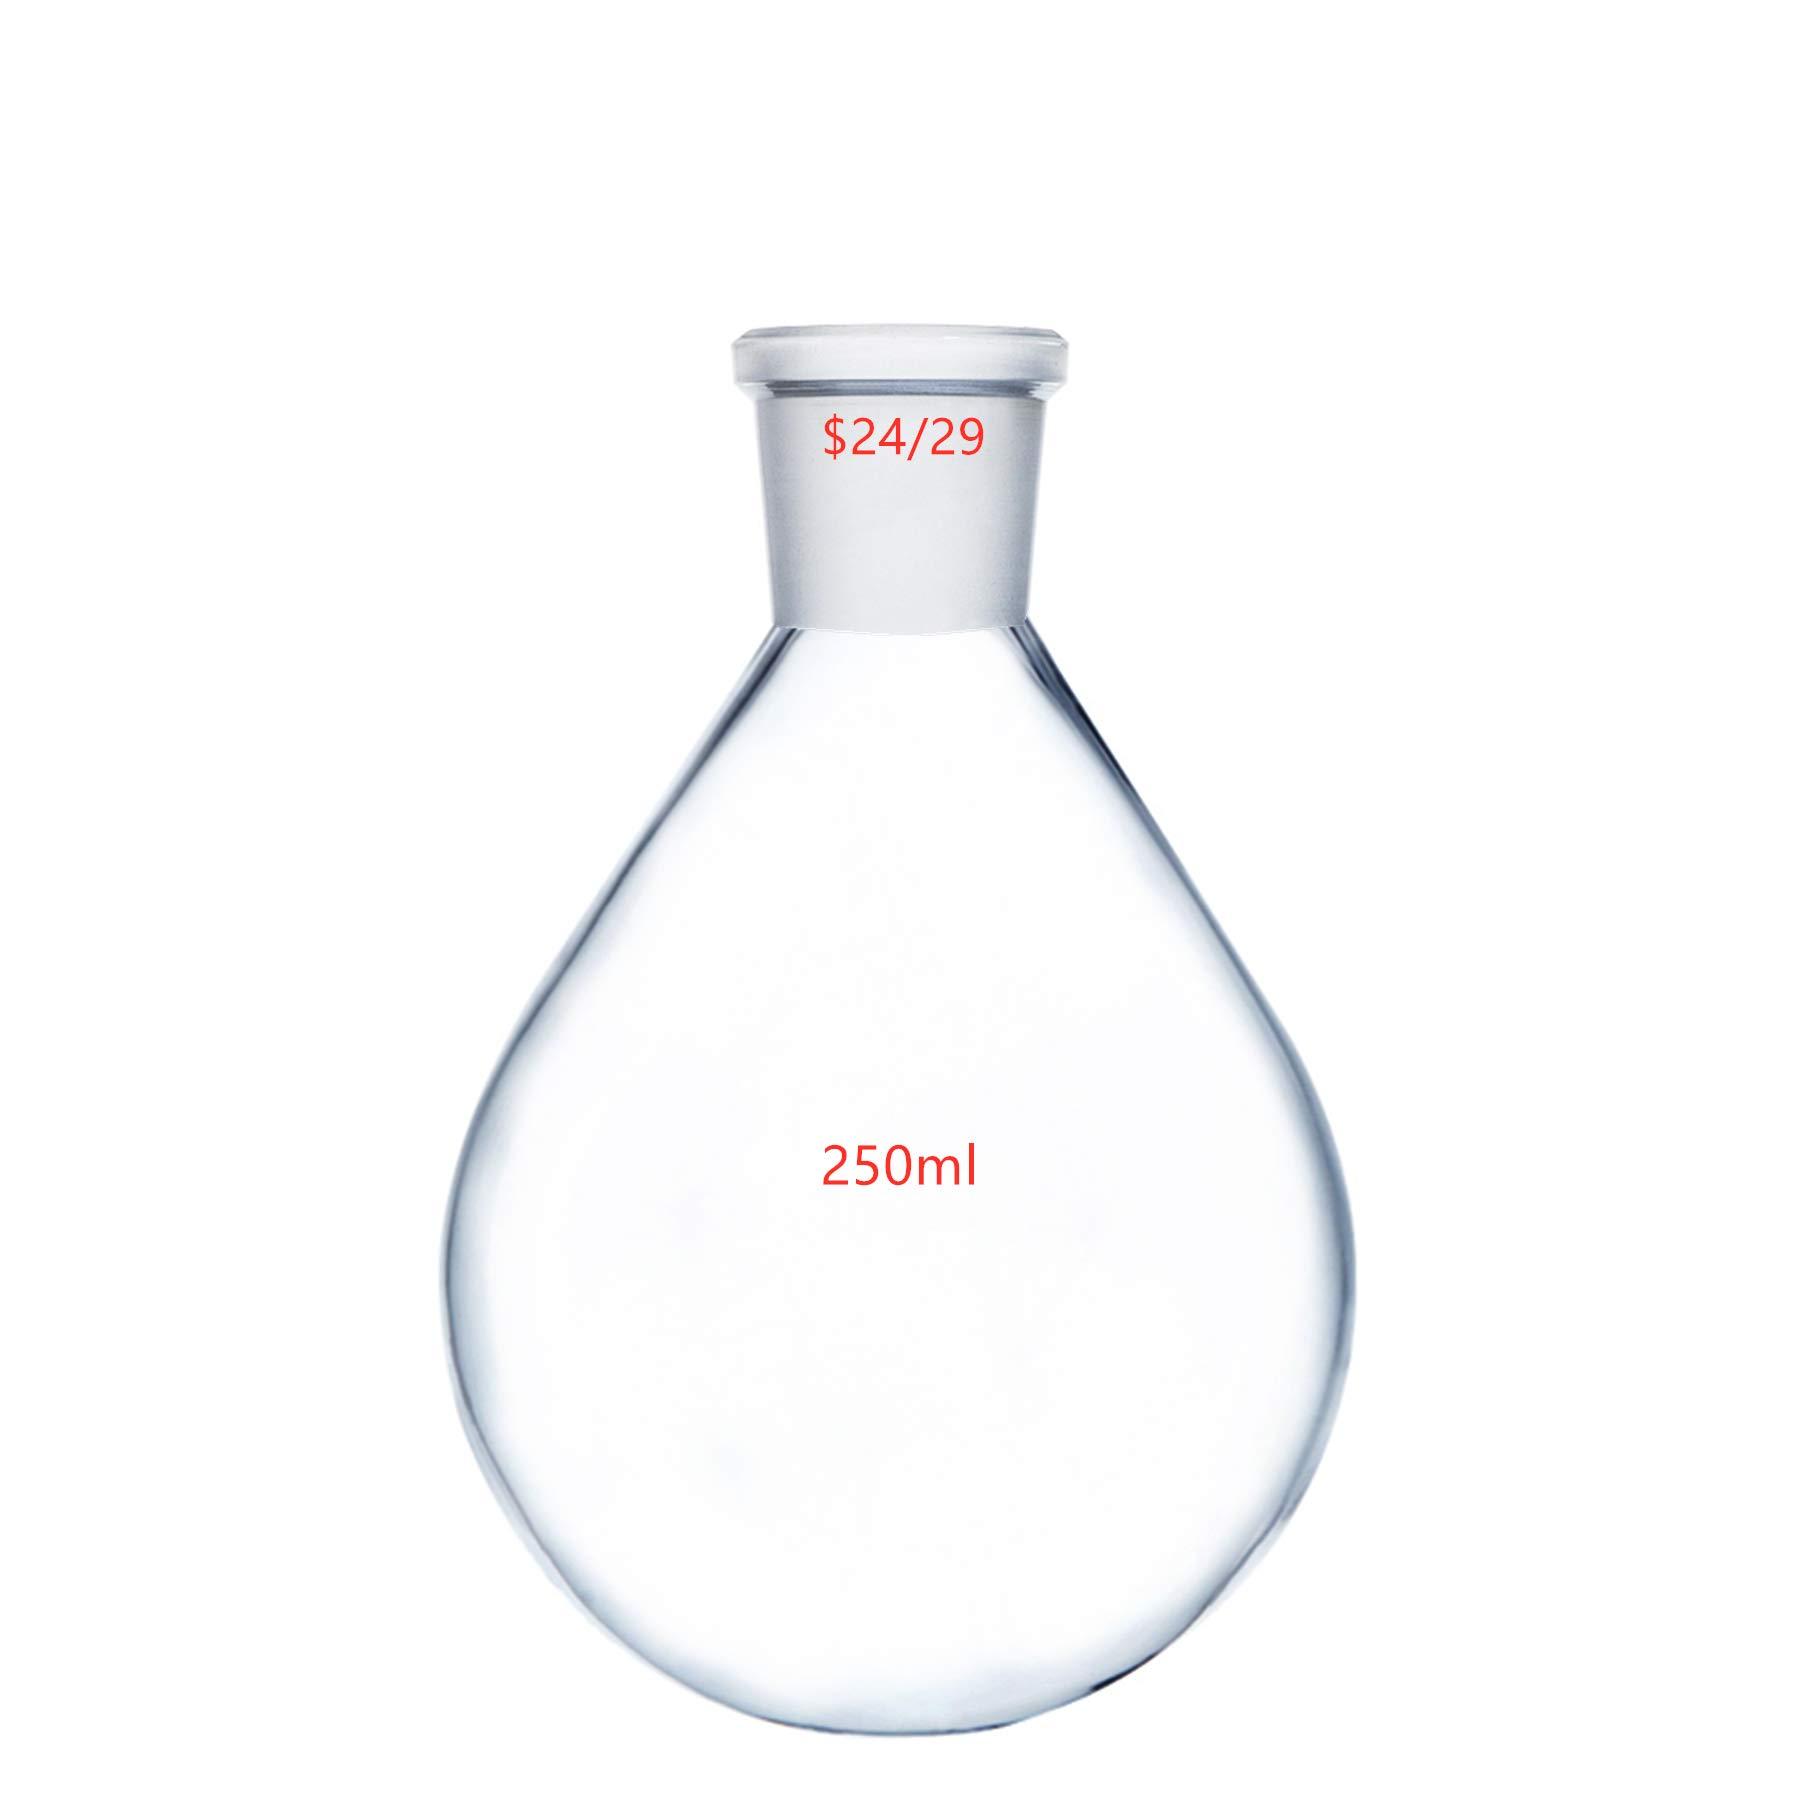 Deschem 250ml 24/29 Glass Recovery Flask Lab Rotary Evaporator Vessel Kjelda Bottle by Deschem